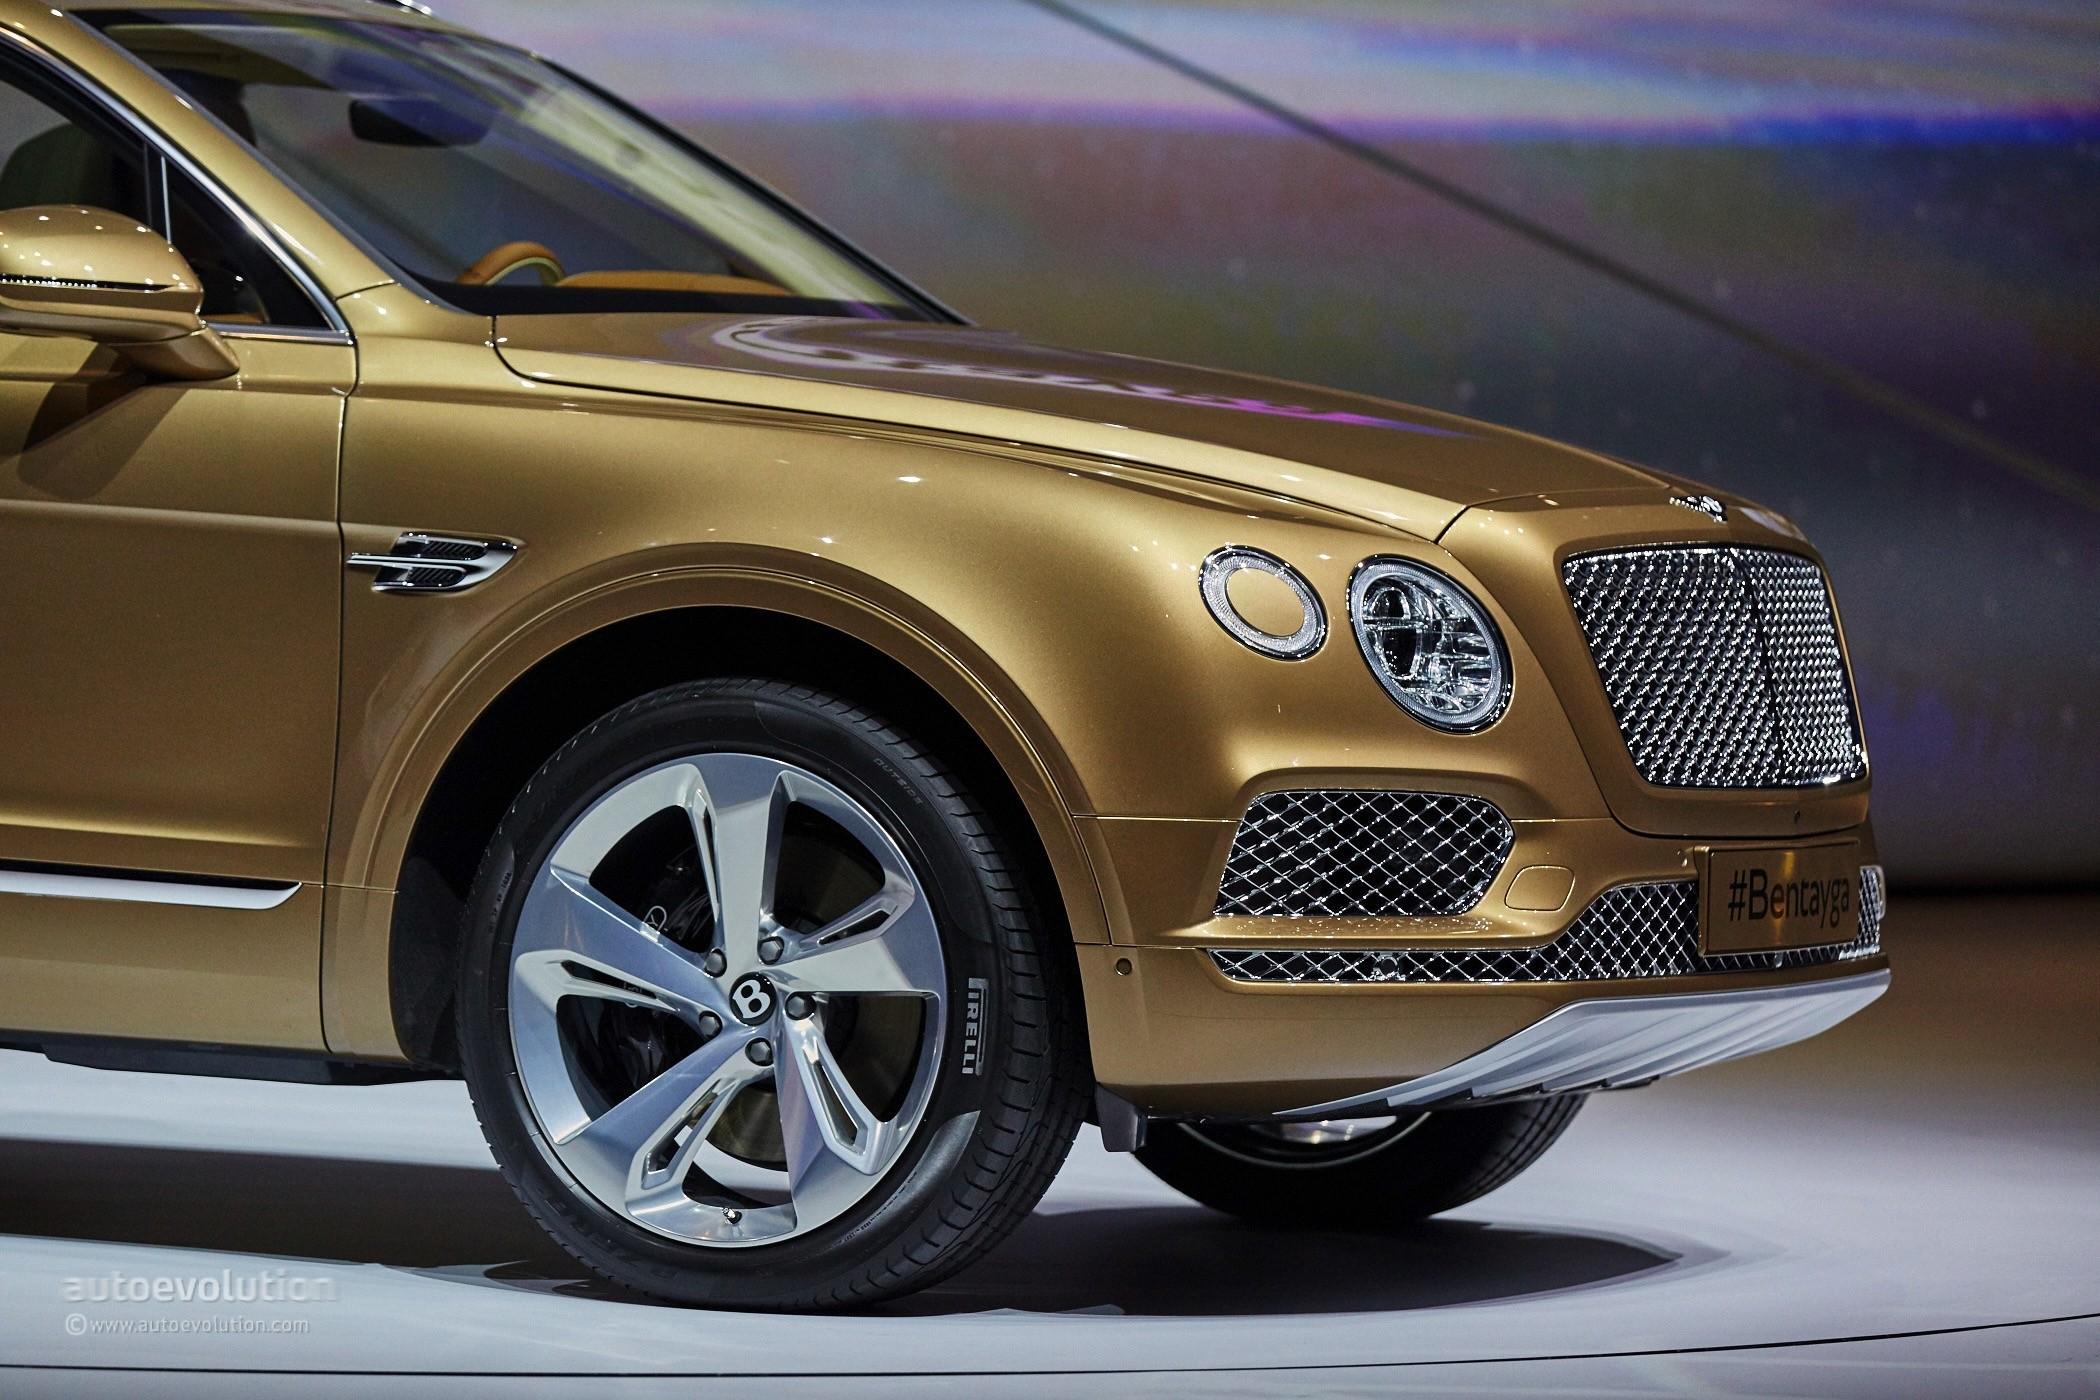 Bentley Bentayga 0 187 Mph Acceleration Test Proves Suv S